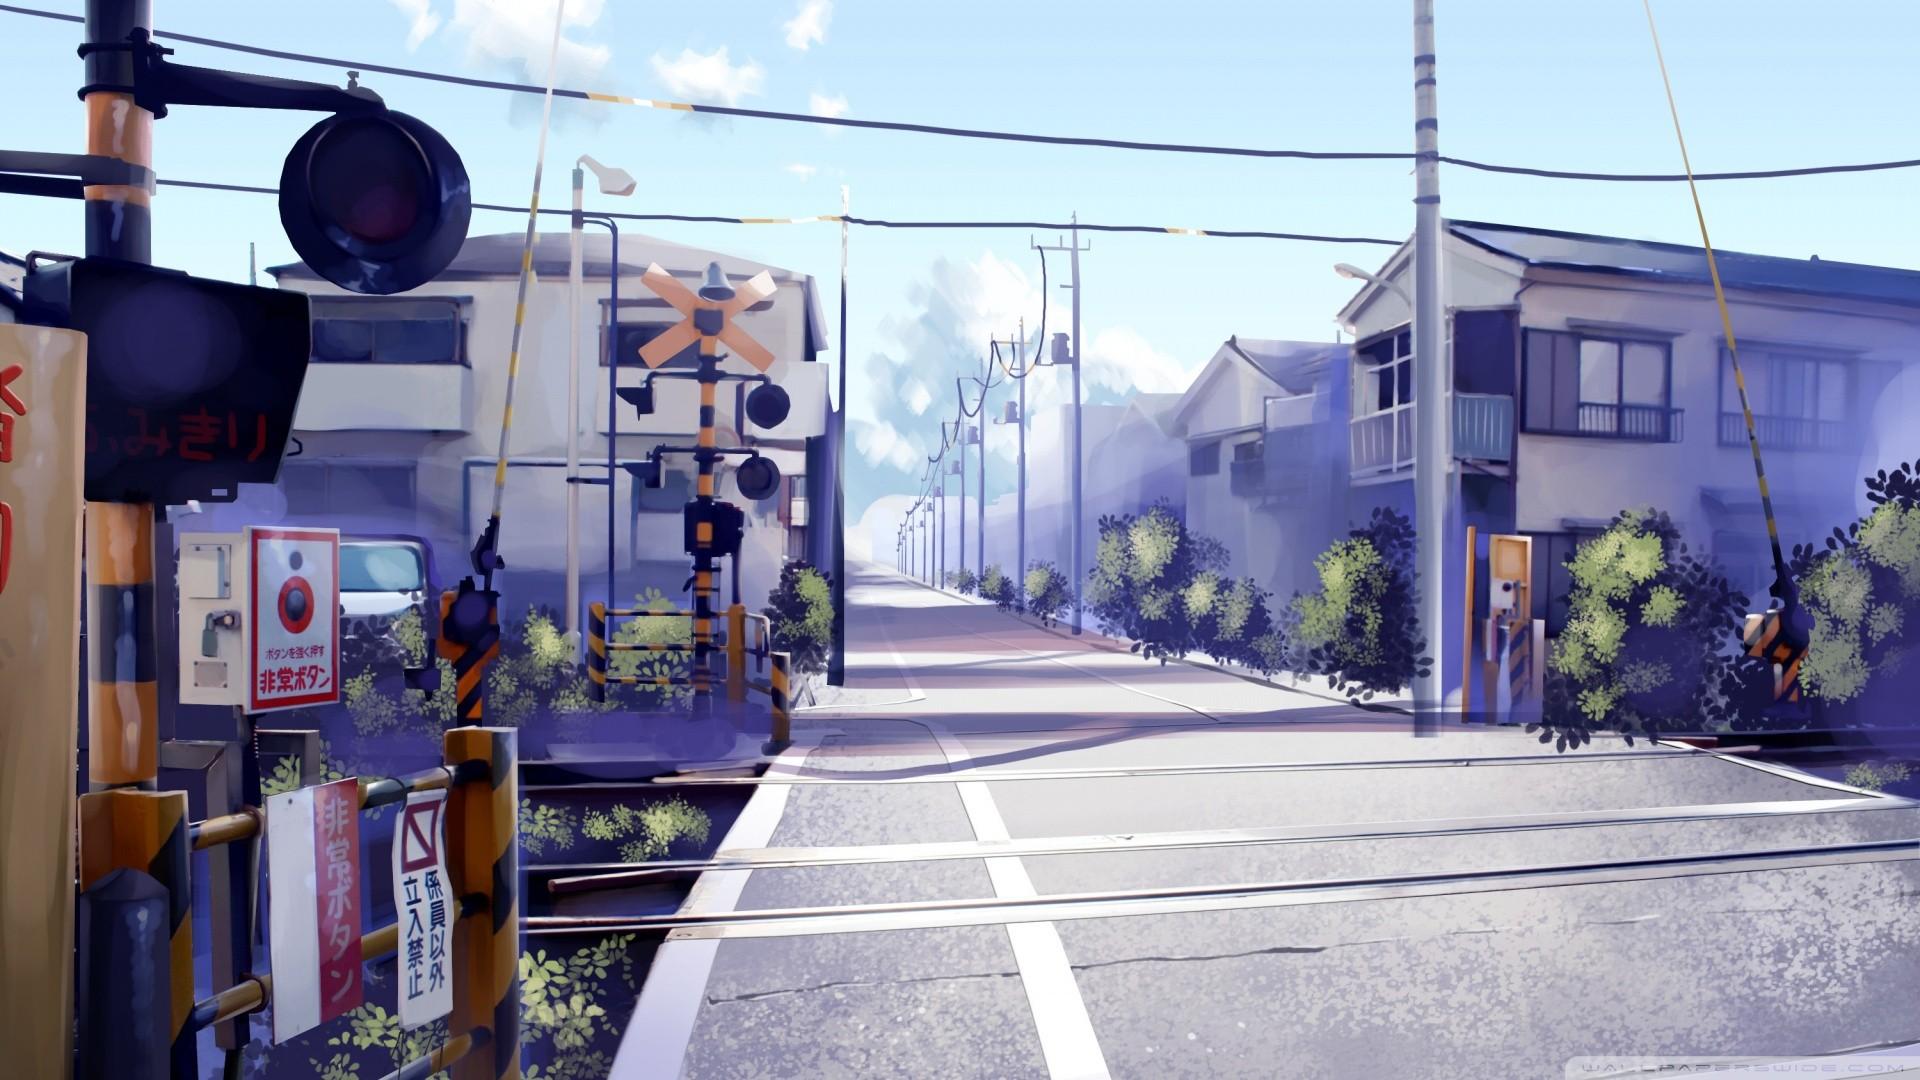 Wallpaper : Japan, street, anime, road, artwork, blue ...